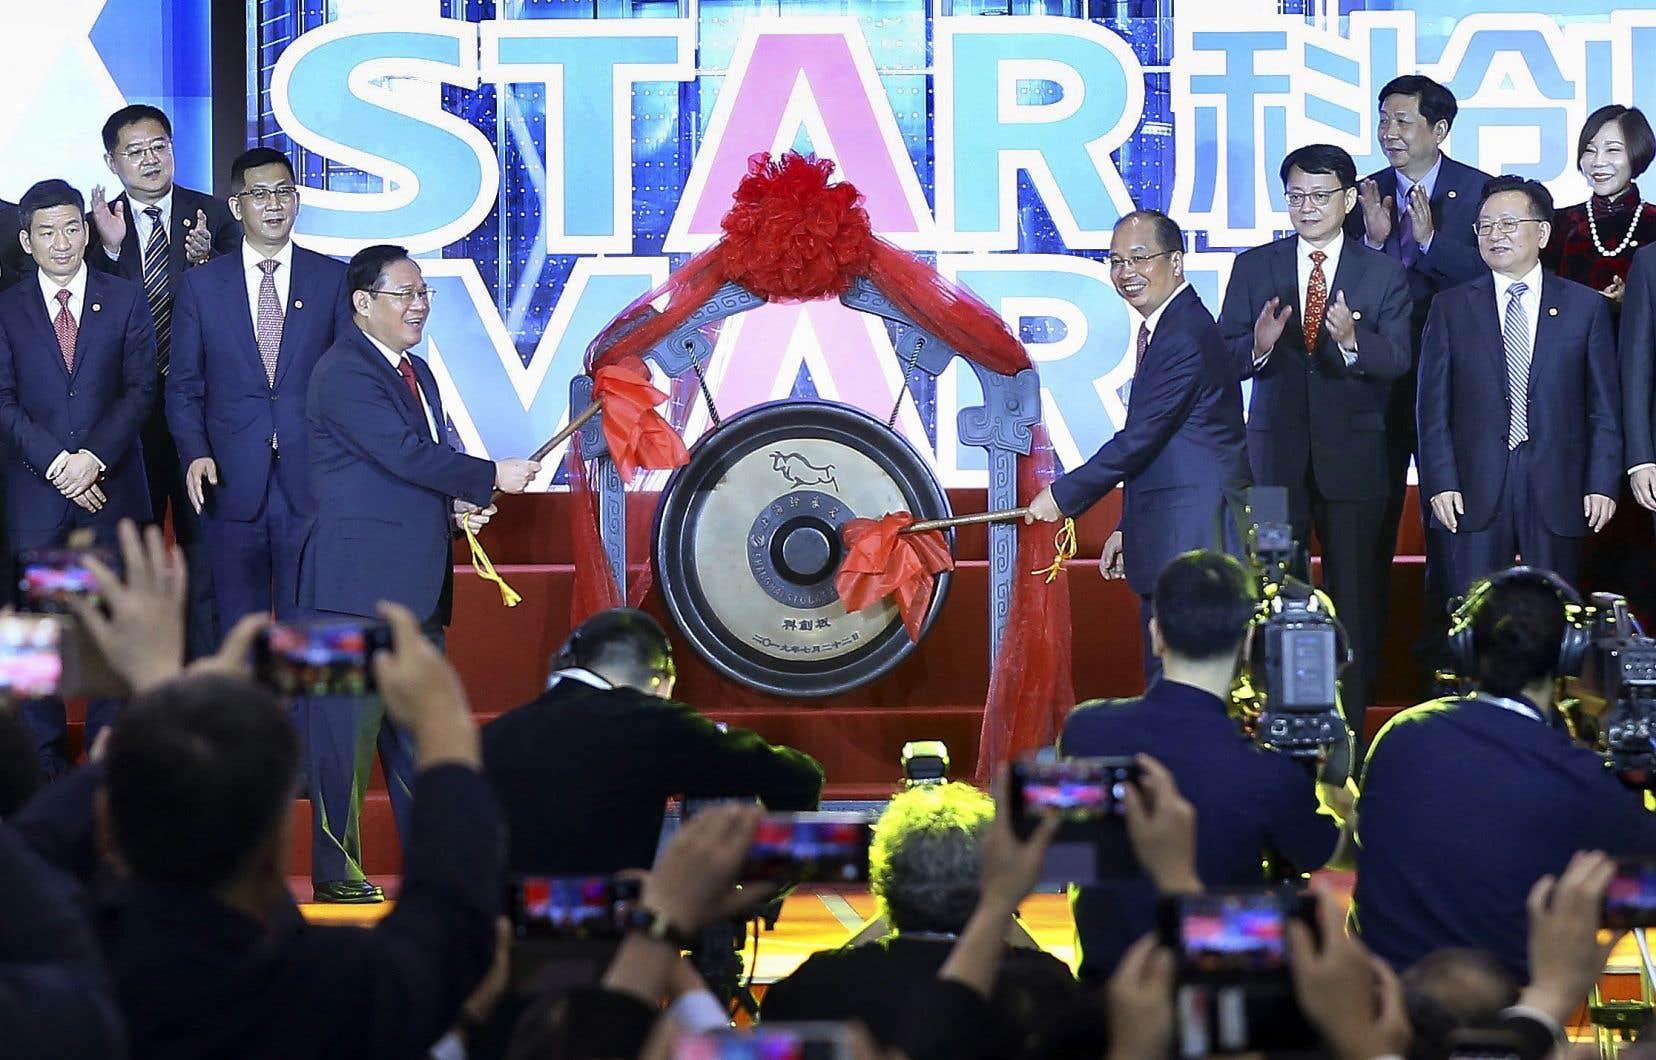 La cérémonie d'inauguration de STAR Market a eu lieu à Shanghai.